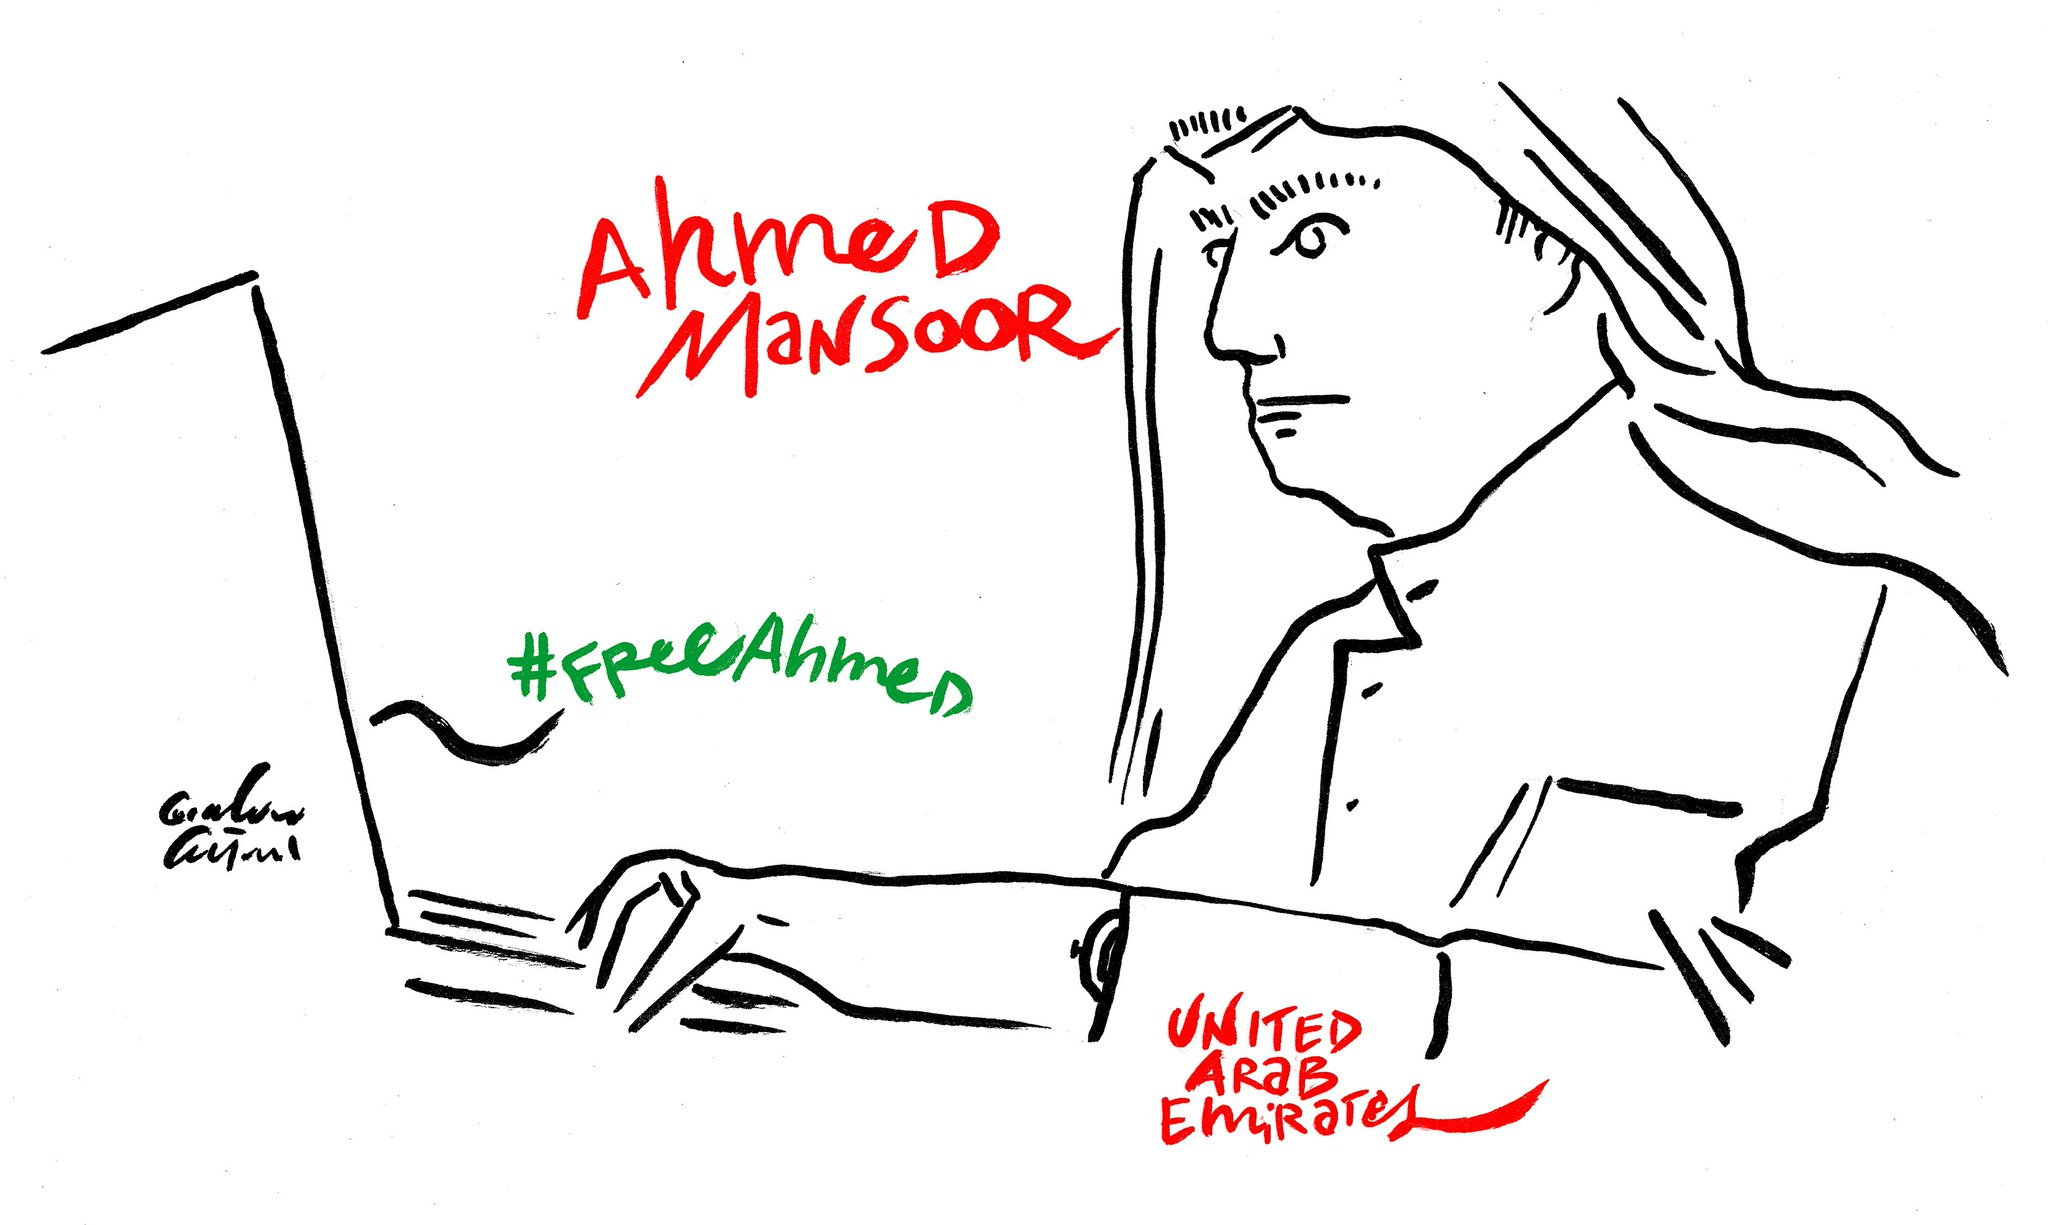 Ahmed Mansoor #freeAhmed https://t.co/A4iIik4d2X @CiLuna27 #UnitedArabEmirates @Ahmed_Mansoor @Amandalavan1 https://t.co/TRoXnyJcqn